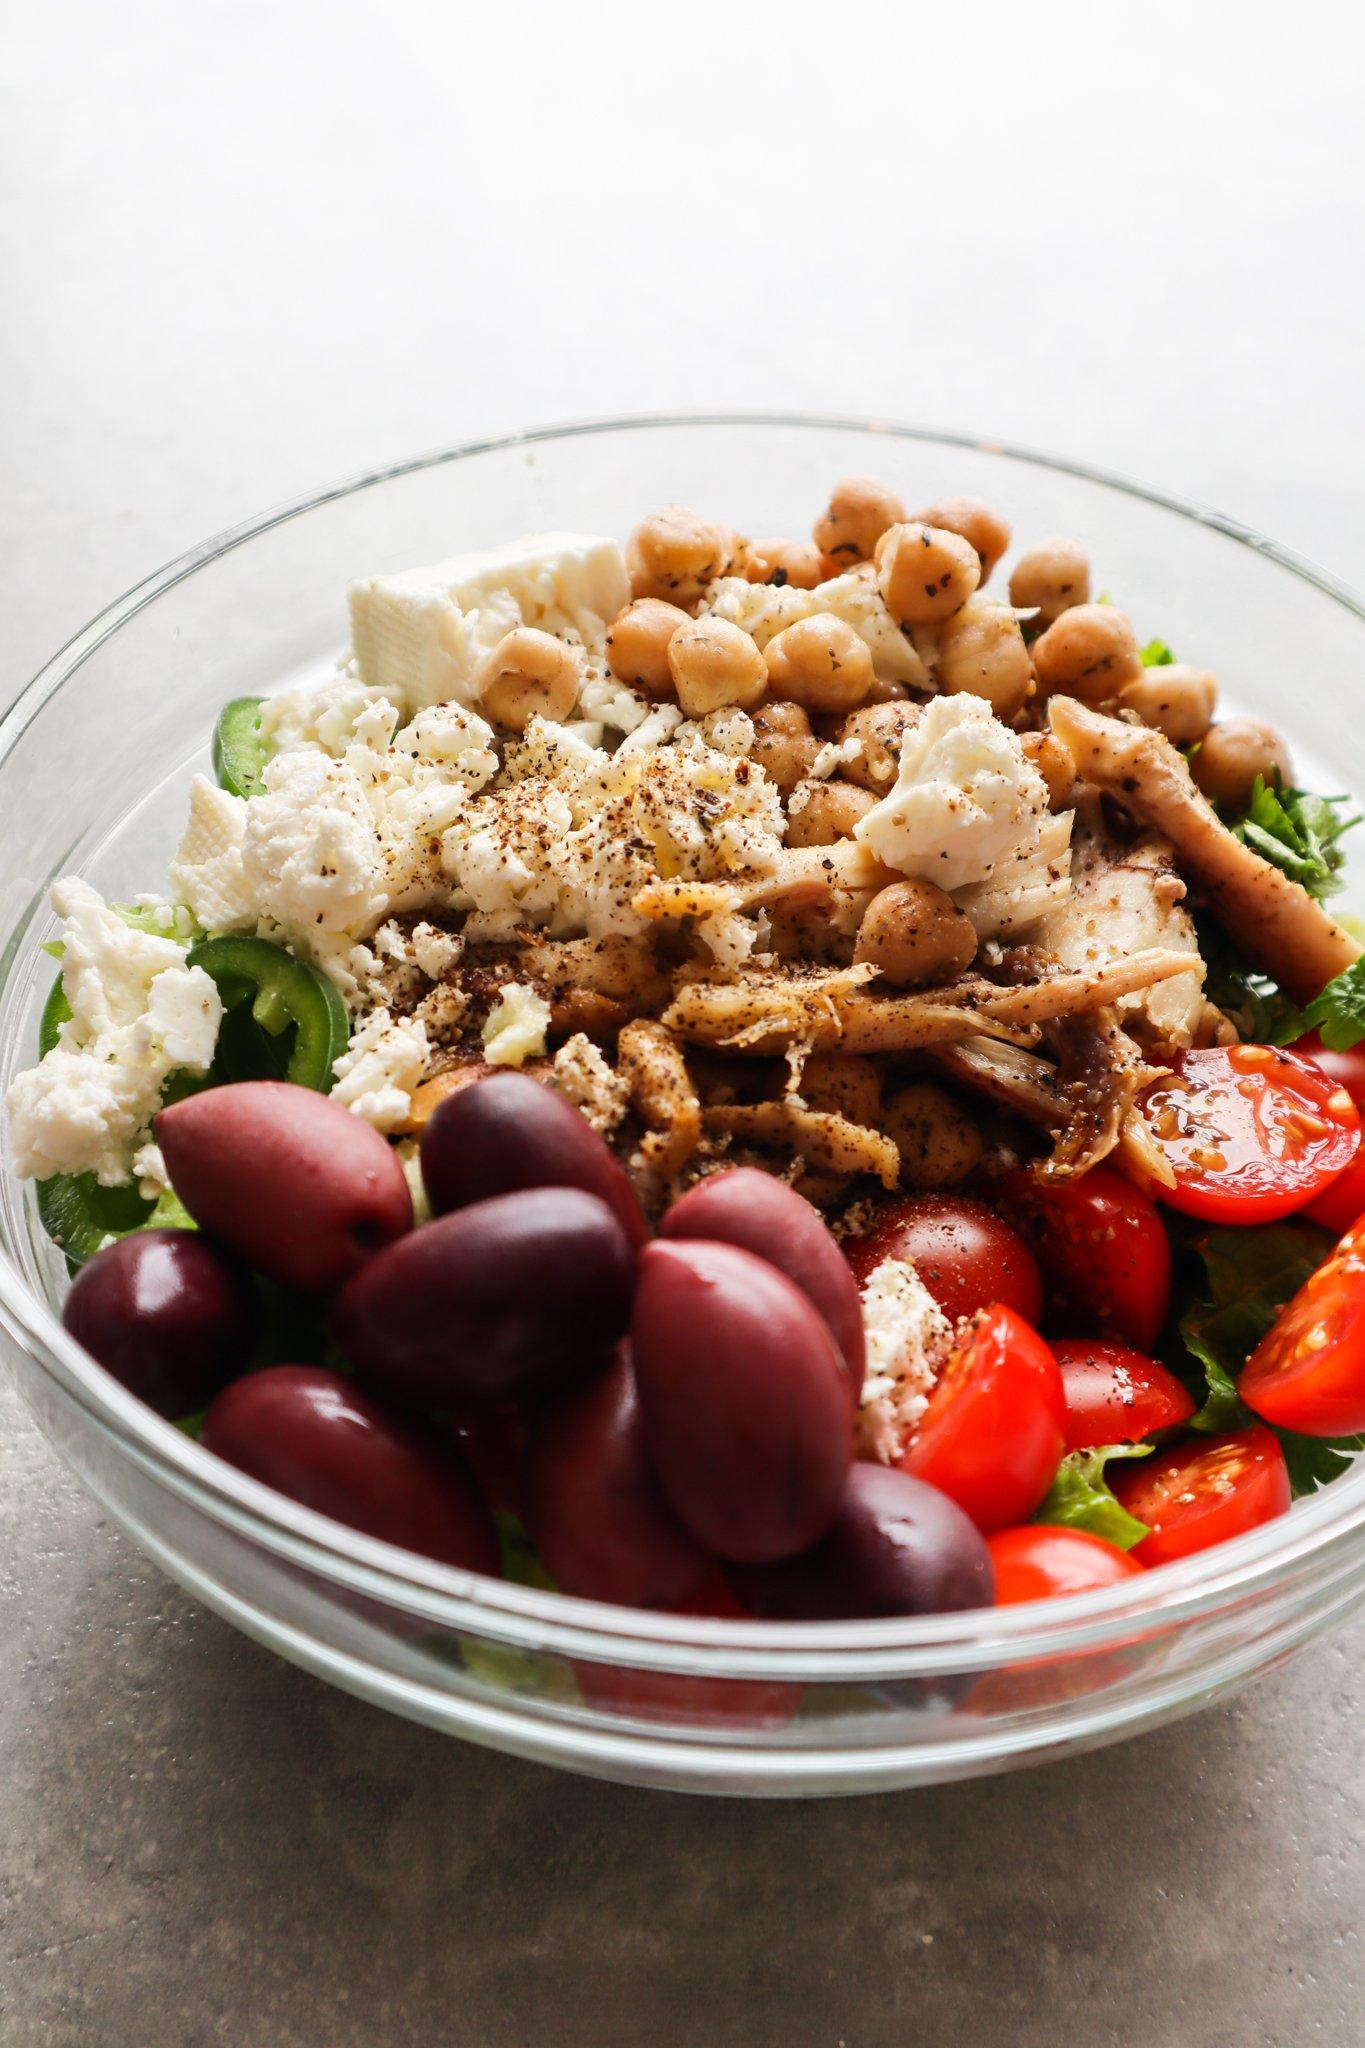 Chicken, chickpea, feta salad - easy Mediterranean diet recipes